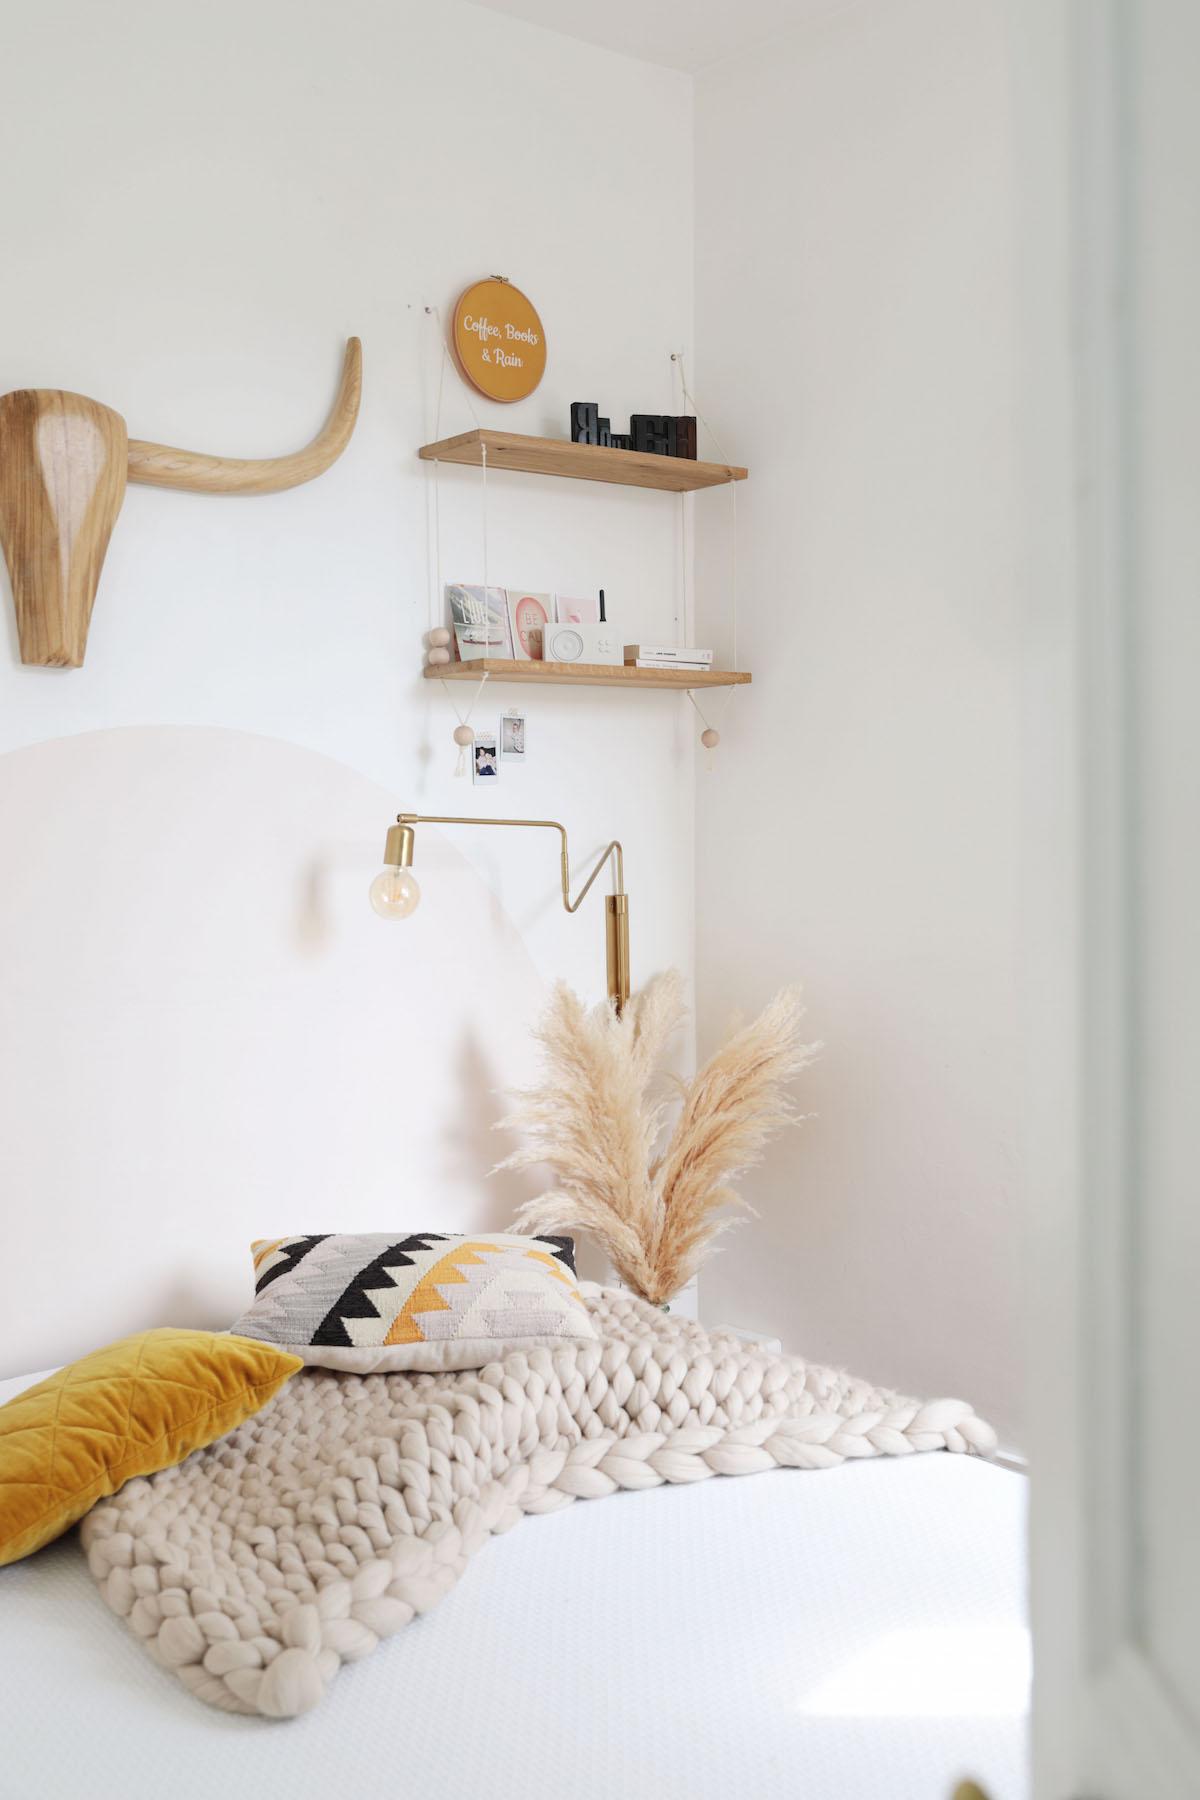 comment organiser sa chambre affordable amnager une. Black Bedroom Furniture Sets. Home Design Ideas